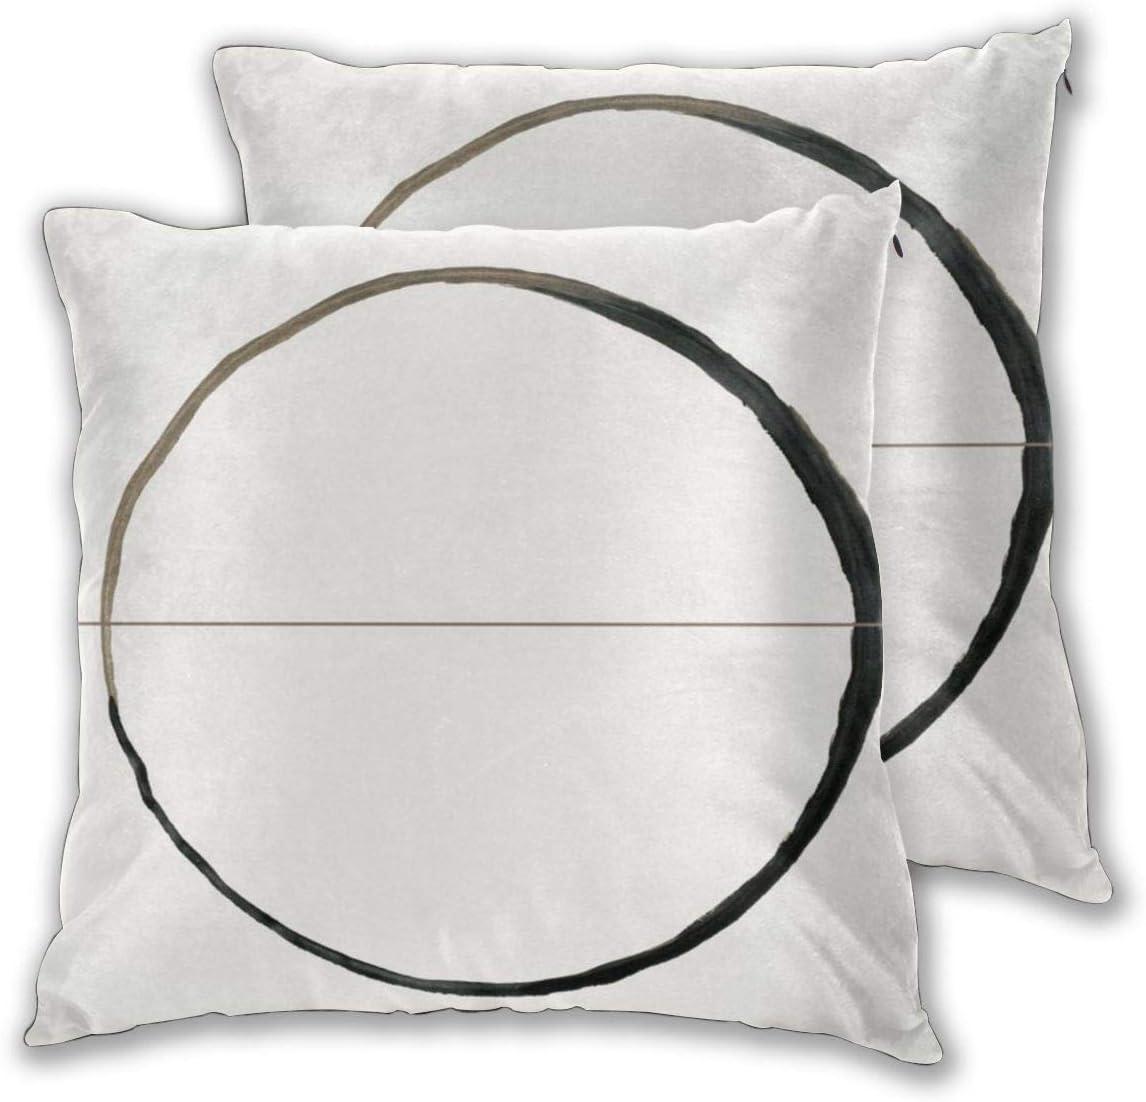 Houlipeng C Rxd Cushion Cover Cotton Home Decorative Square for Sofa Throw Pillow Case 18 x 18 Inch, 45cm x 45cm 2 Pack: Amazon.es: Jardín